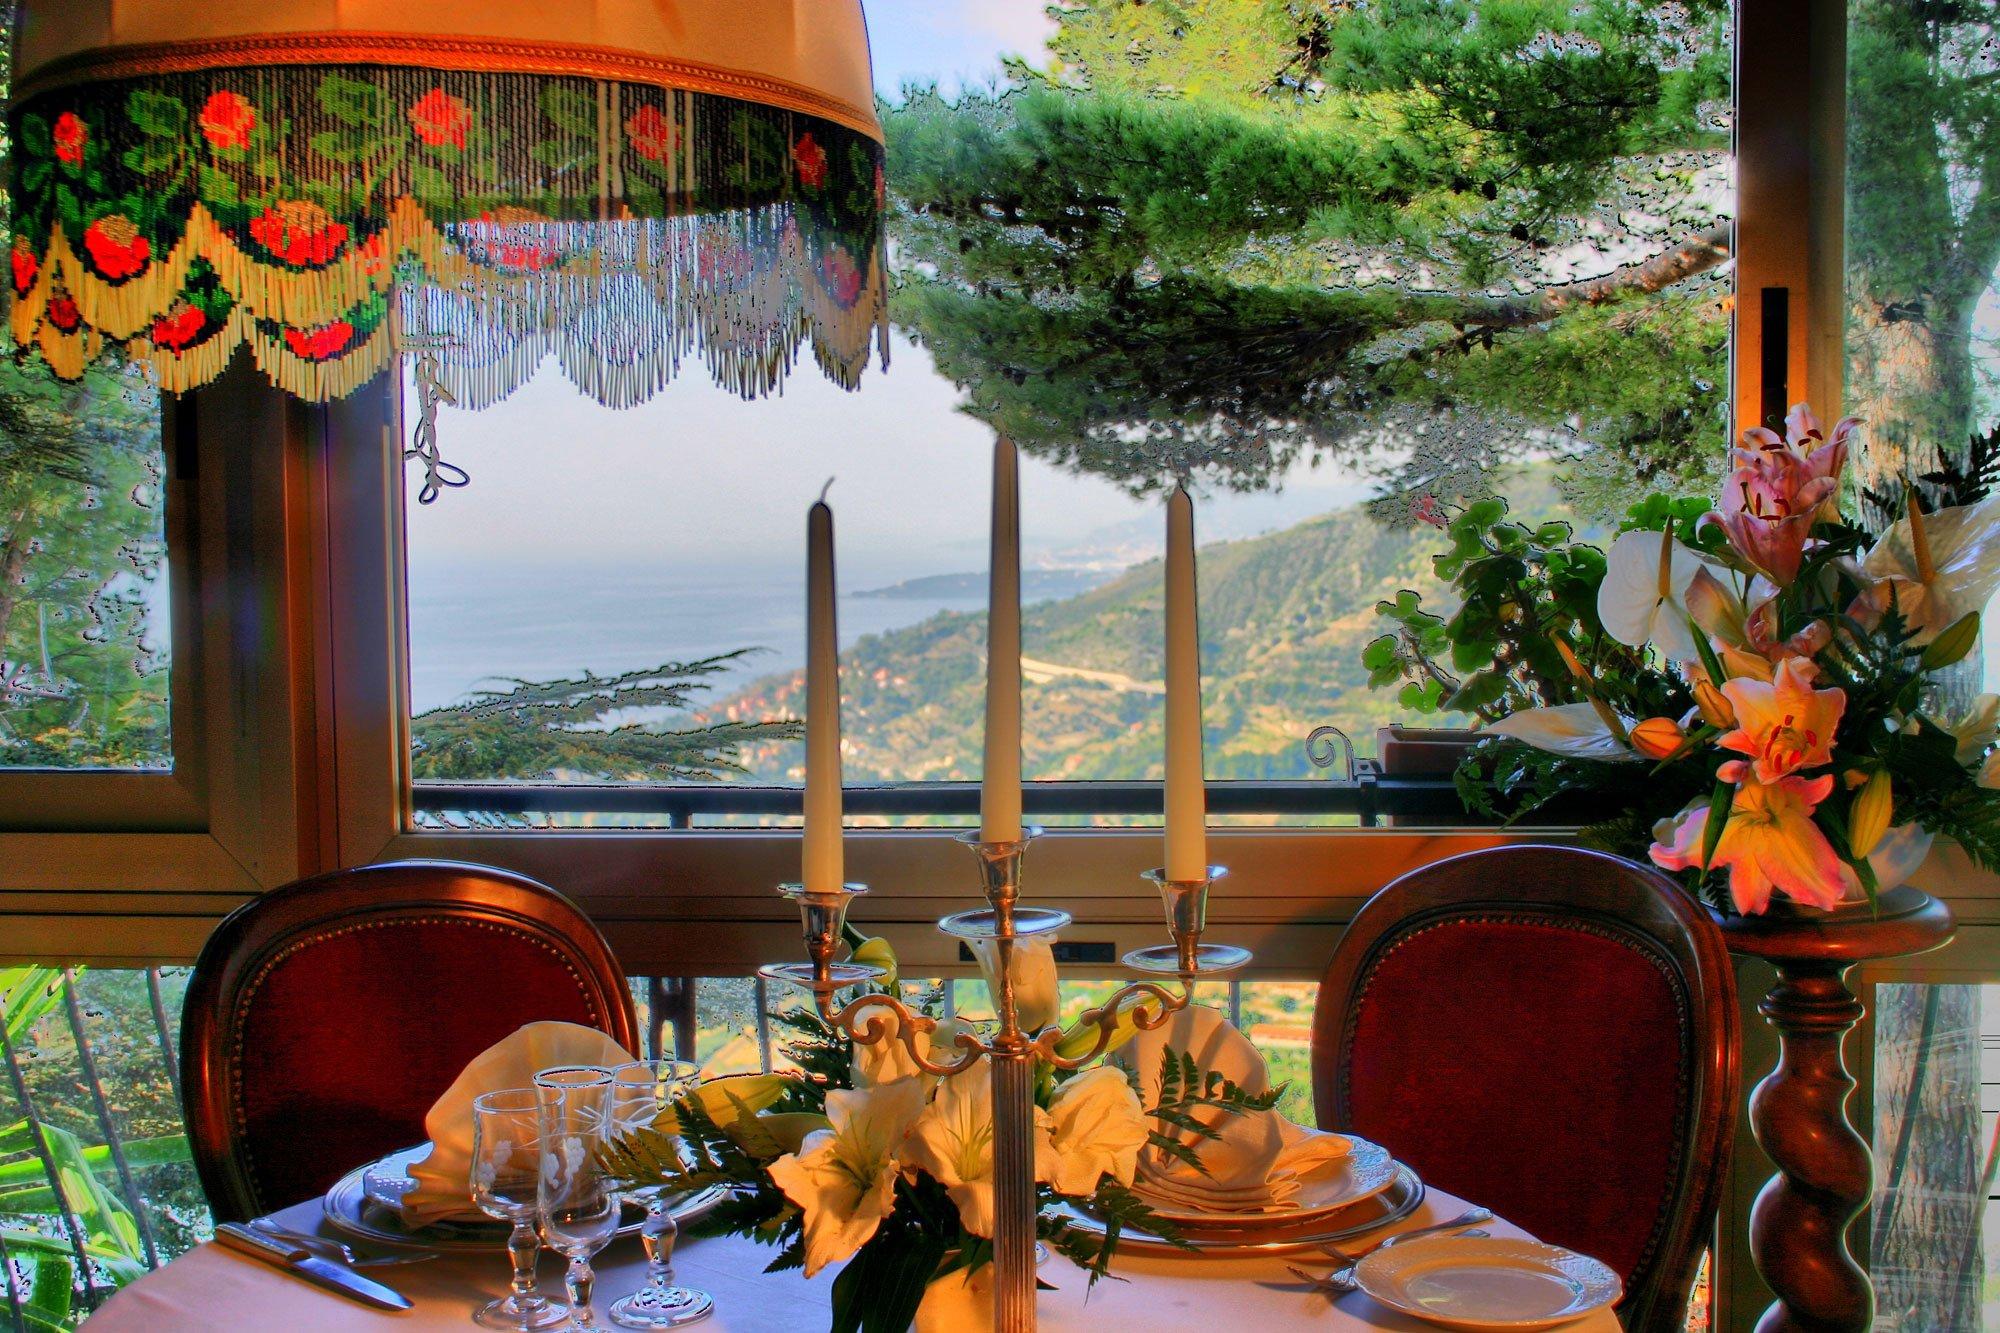 Things To Do in Ligurian, Restaurants in Ligurian